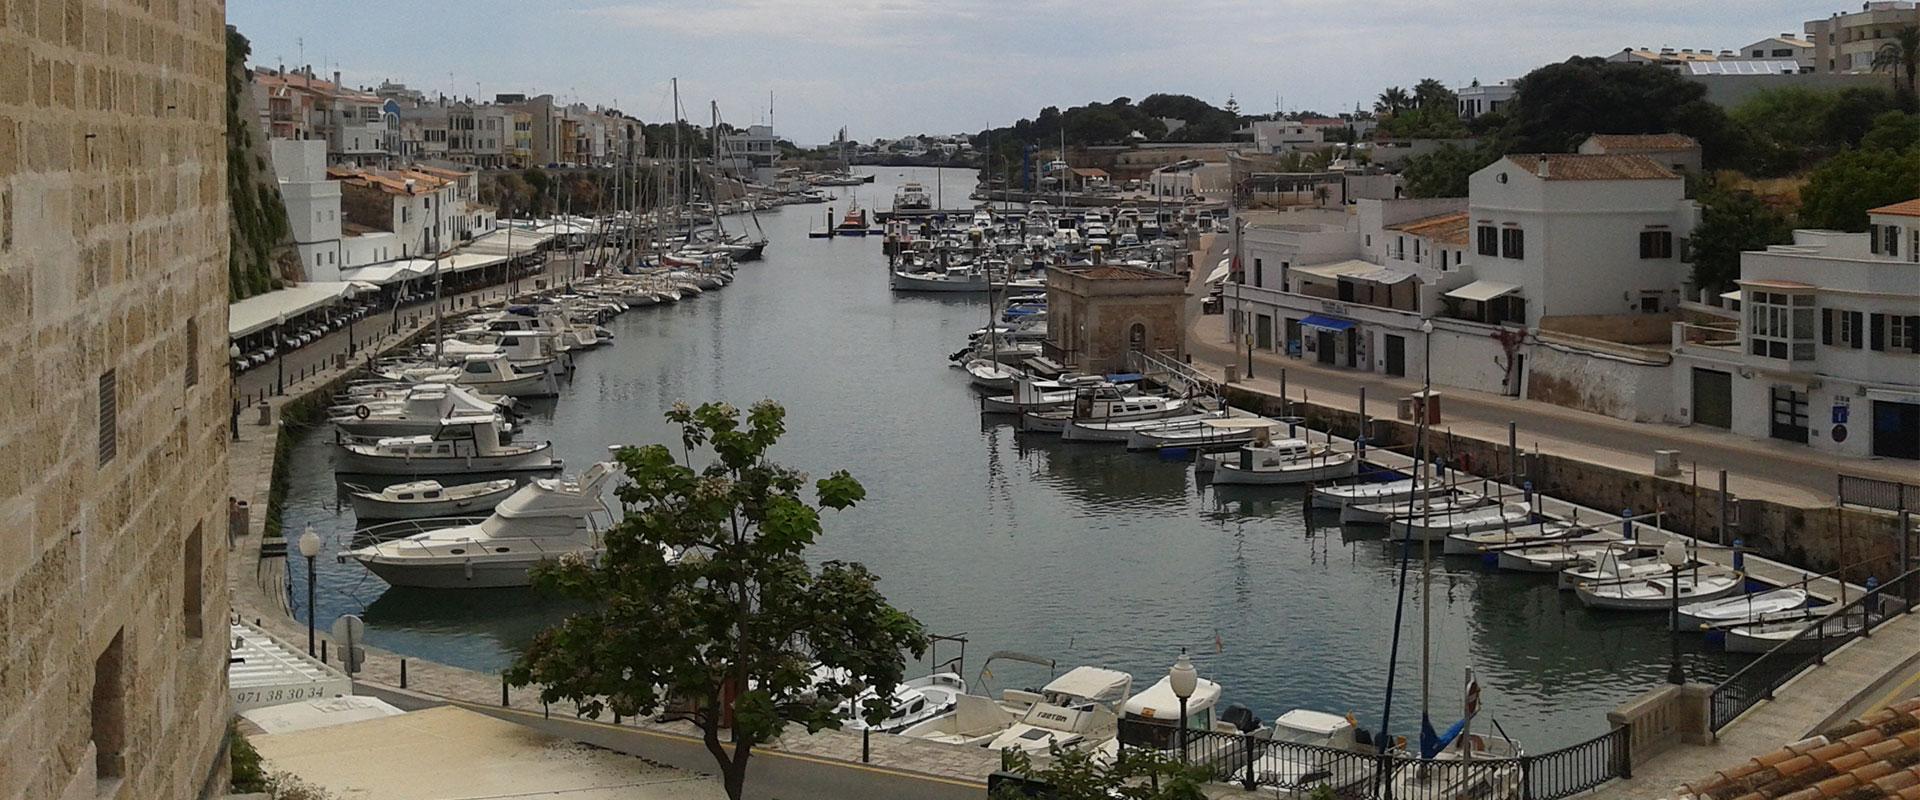 Menorca - M.Sirer